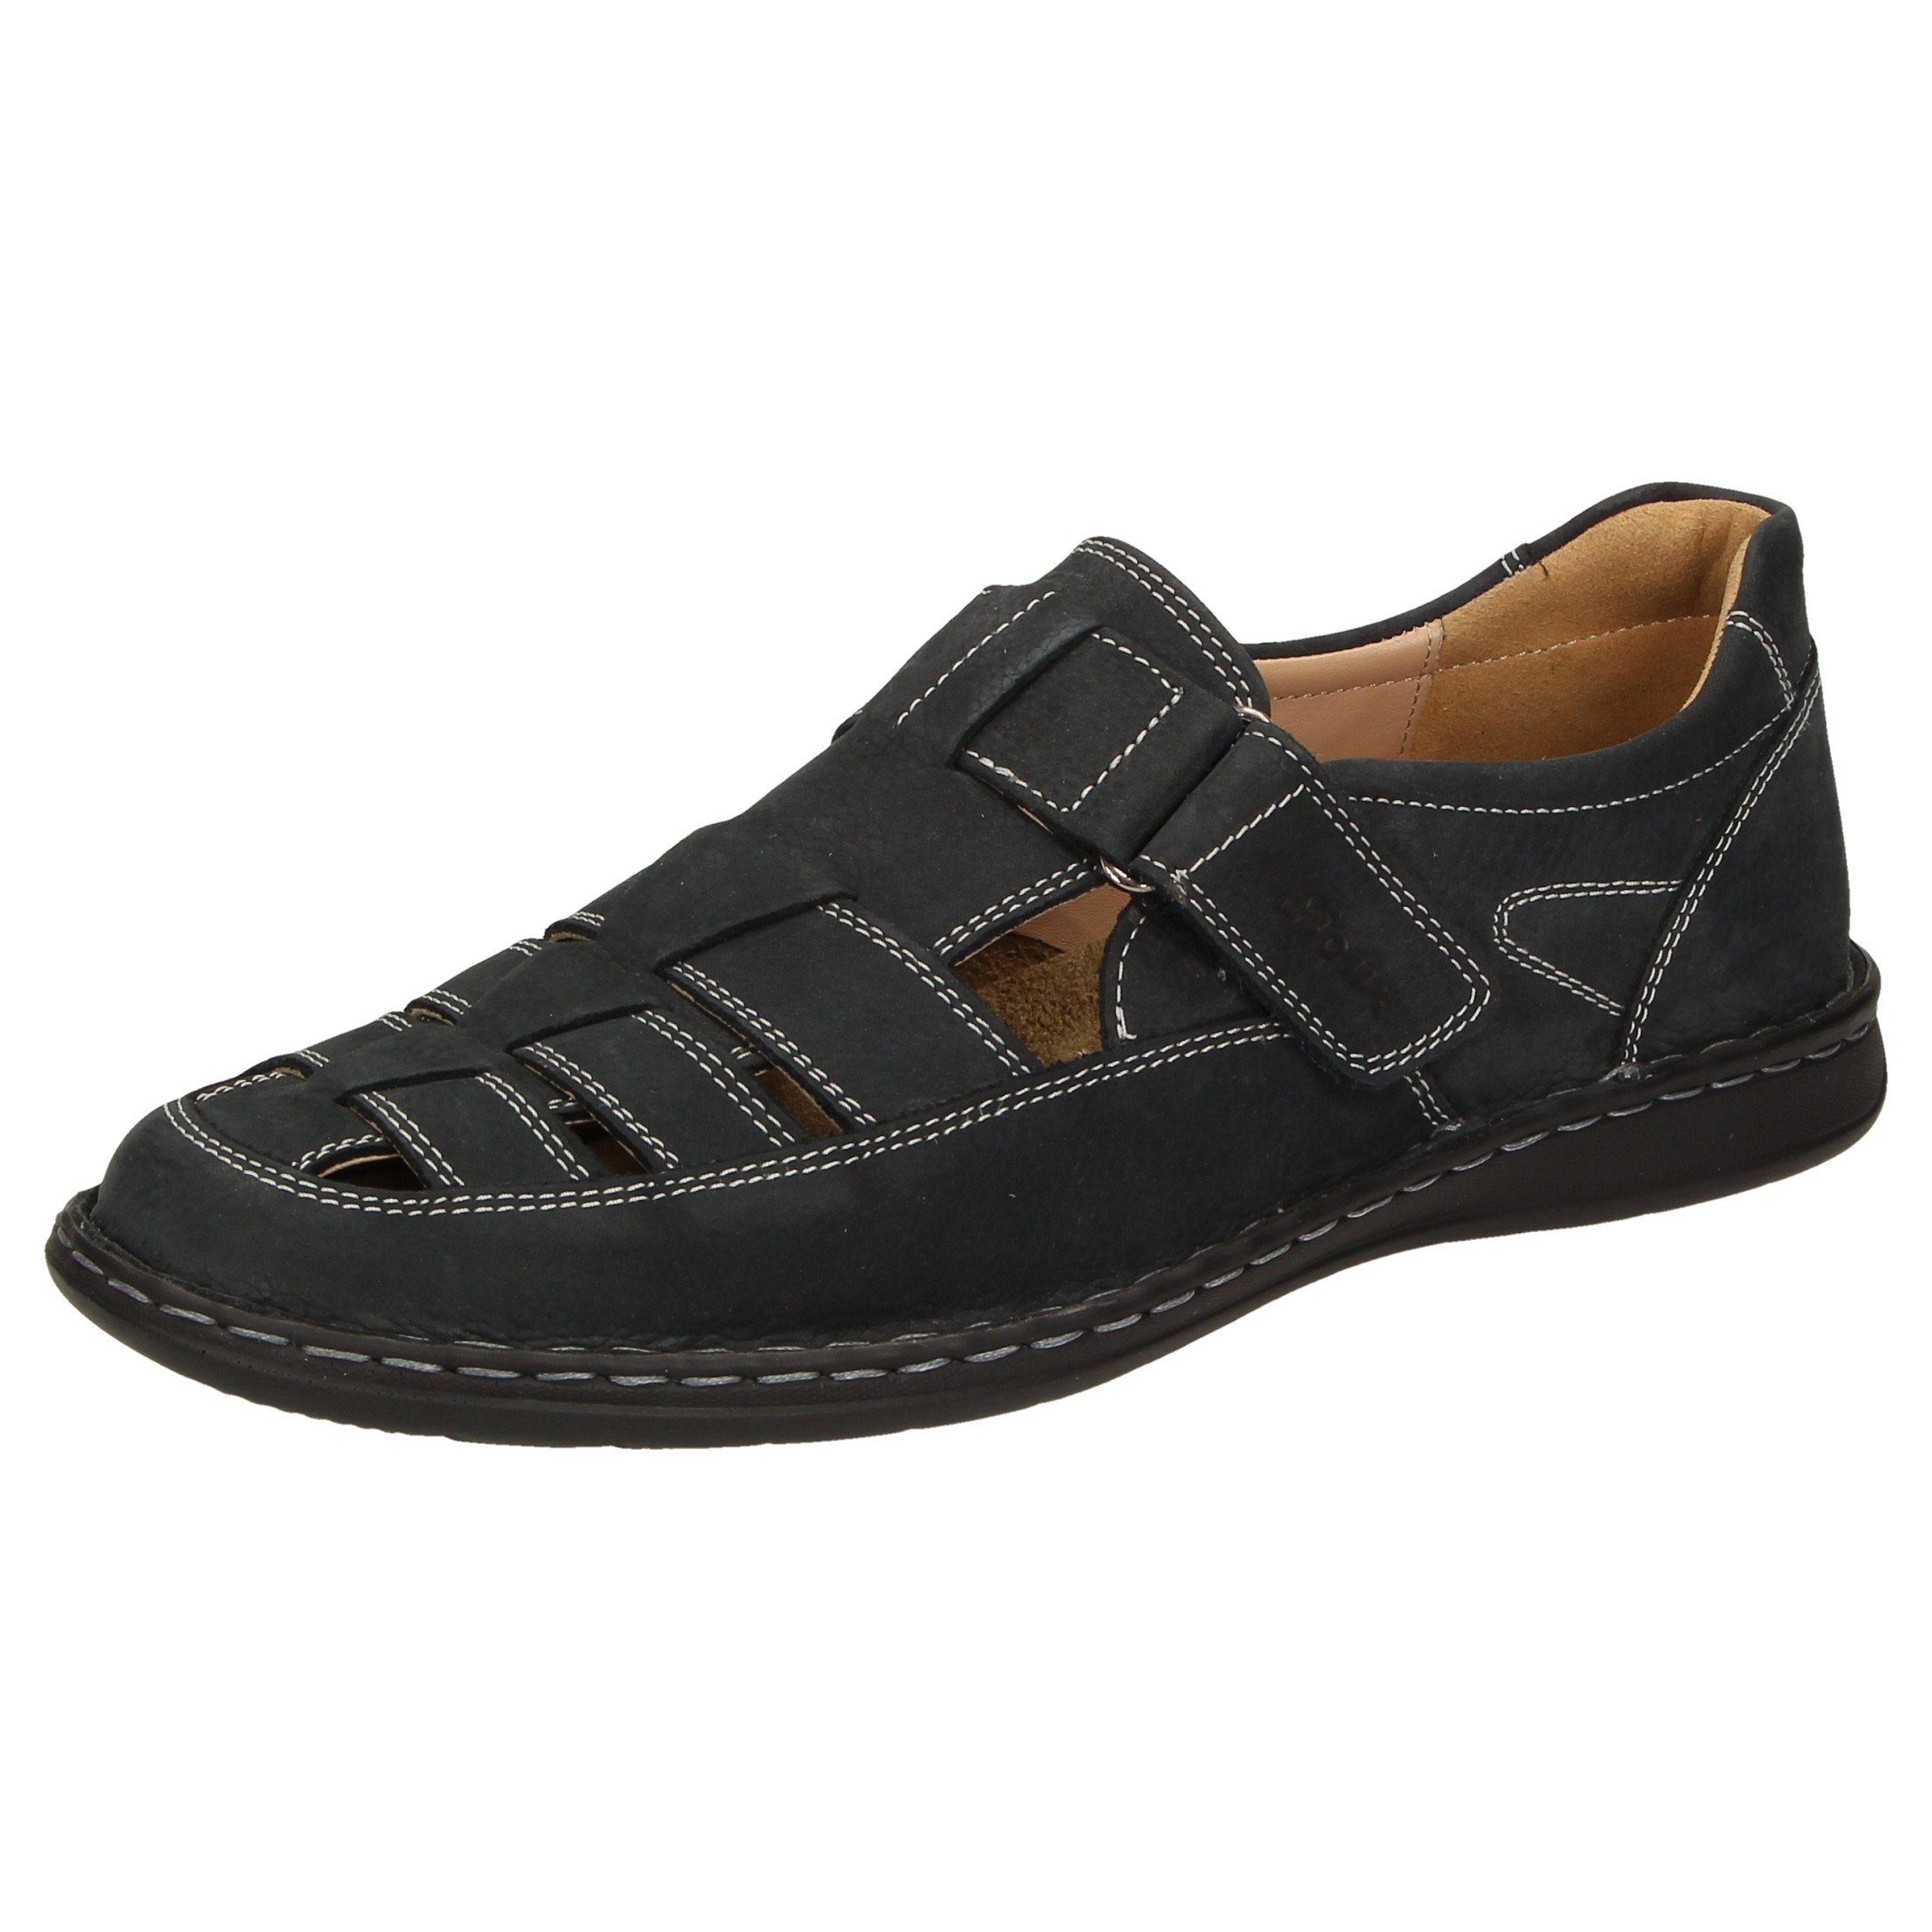 SIOUX Sandale Elcino-191 | Schuhe > Sandalen & Zehentrenner > Sandalen | Blau | Leder - Microfaser - Textil - Pu | Sioux